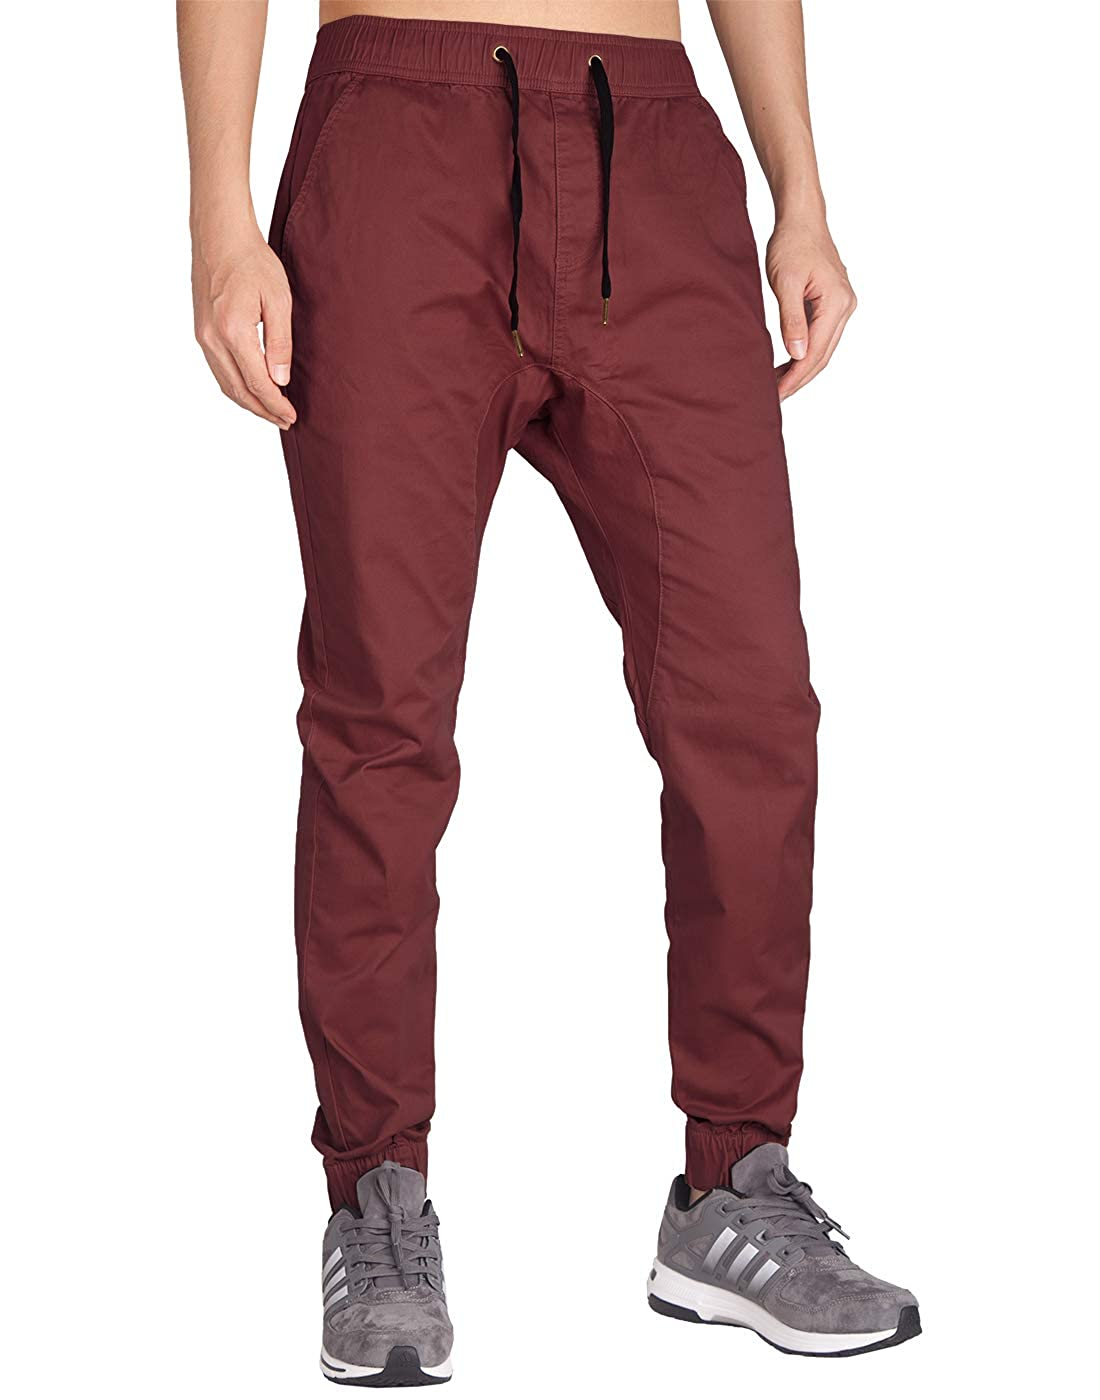 0a96c1cf ITALY MORN Men's Chino Jogger Casual Pants Khakis Jogging Slim Fit Elastic  Waistband